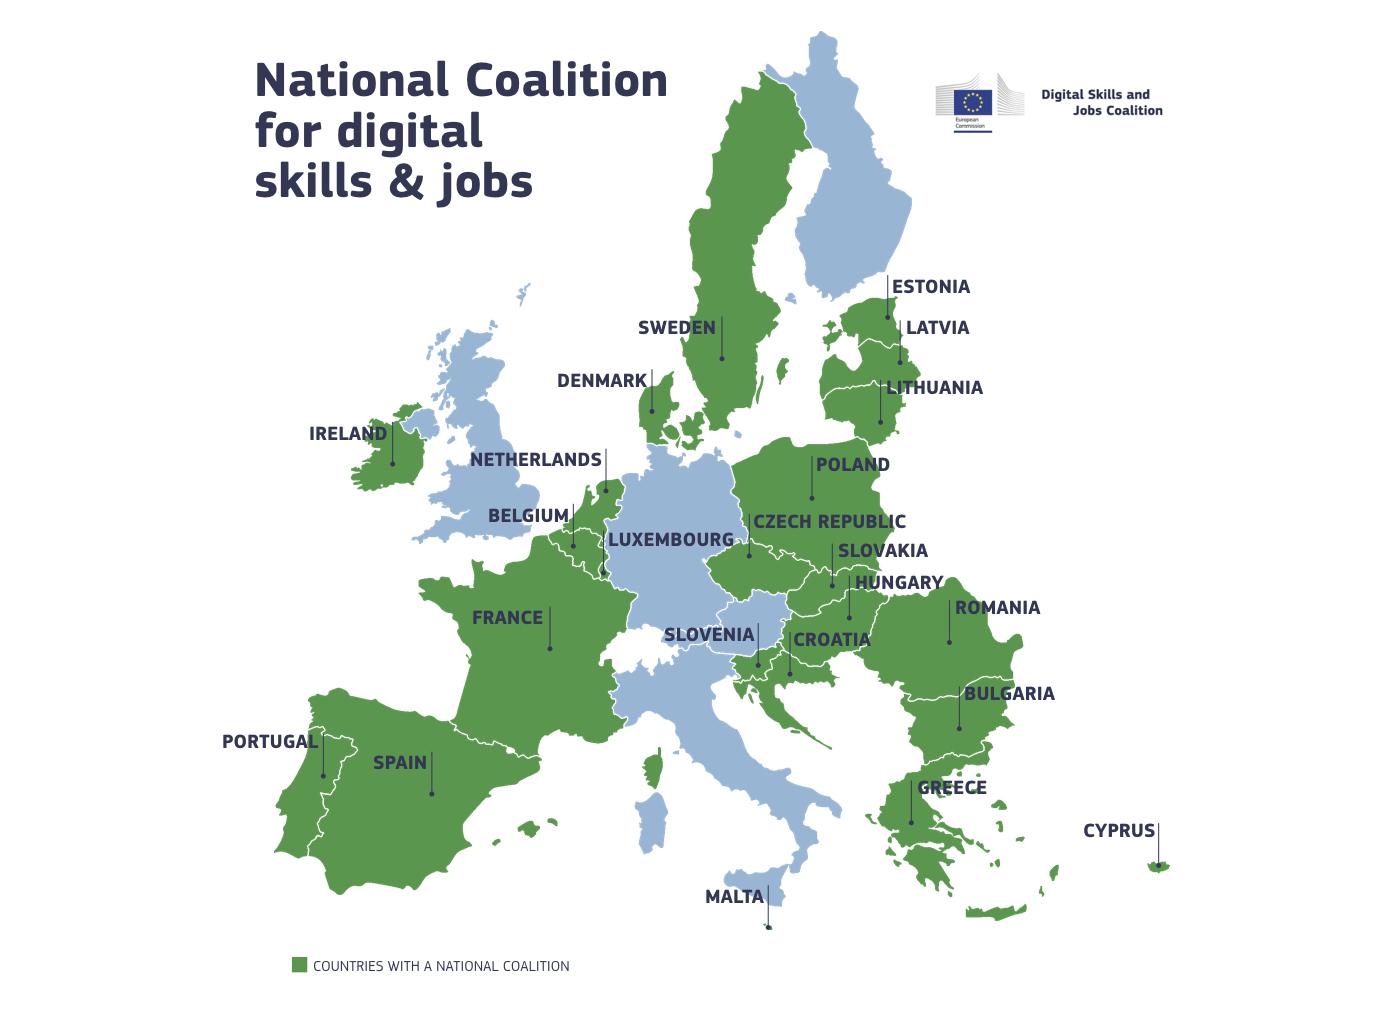 national coalition map